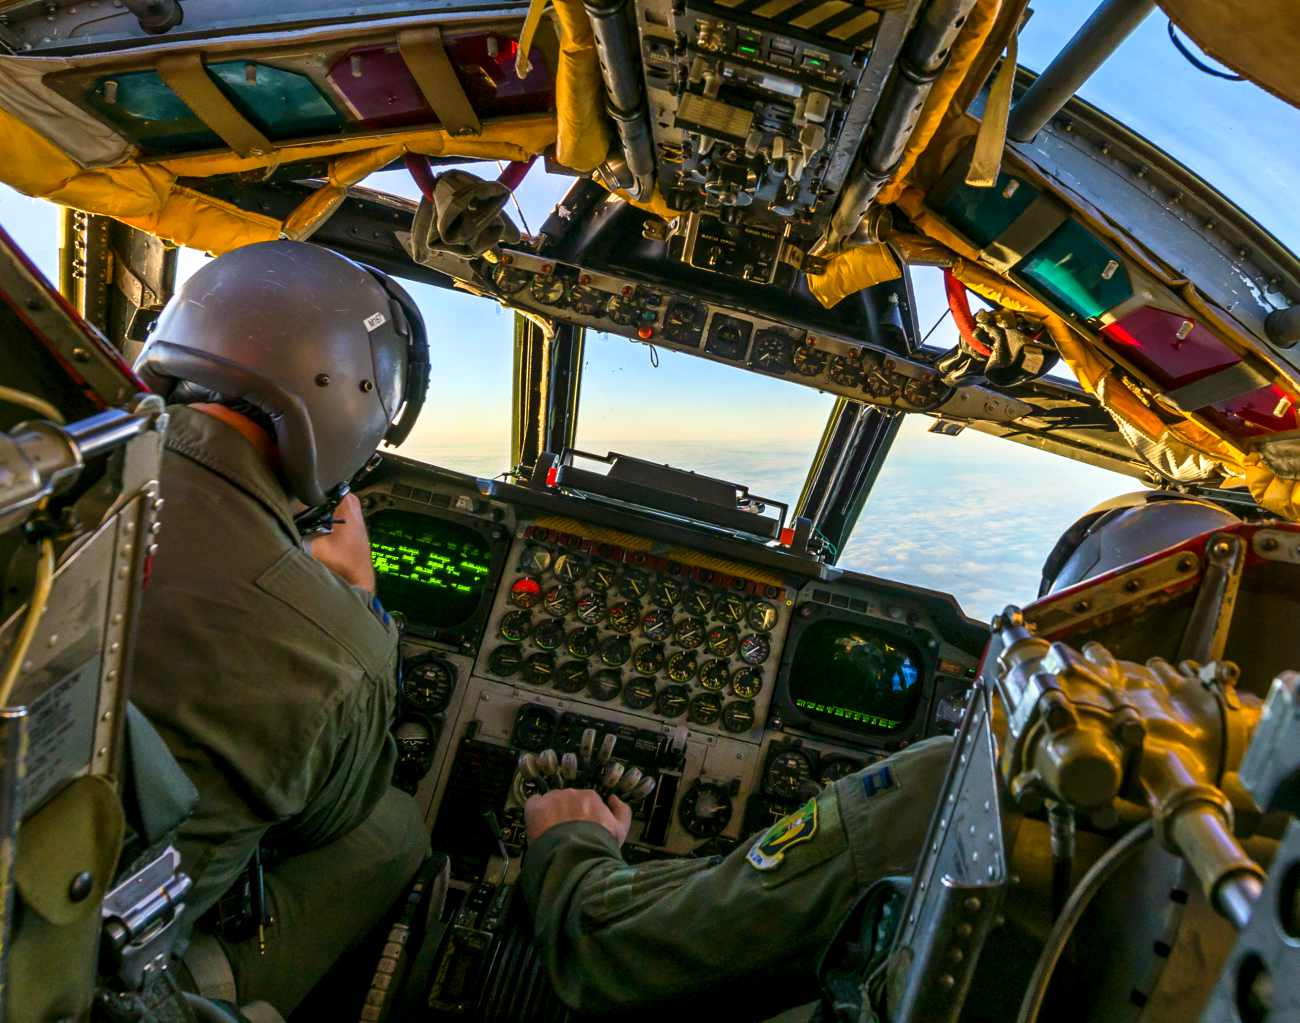 Fighter Aircraft Cockpit_B-52 Cockpit